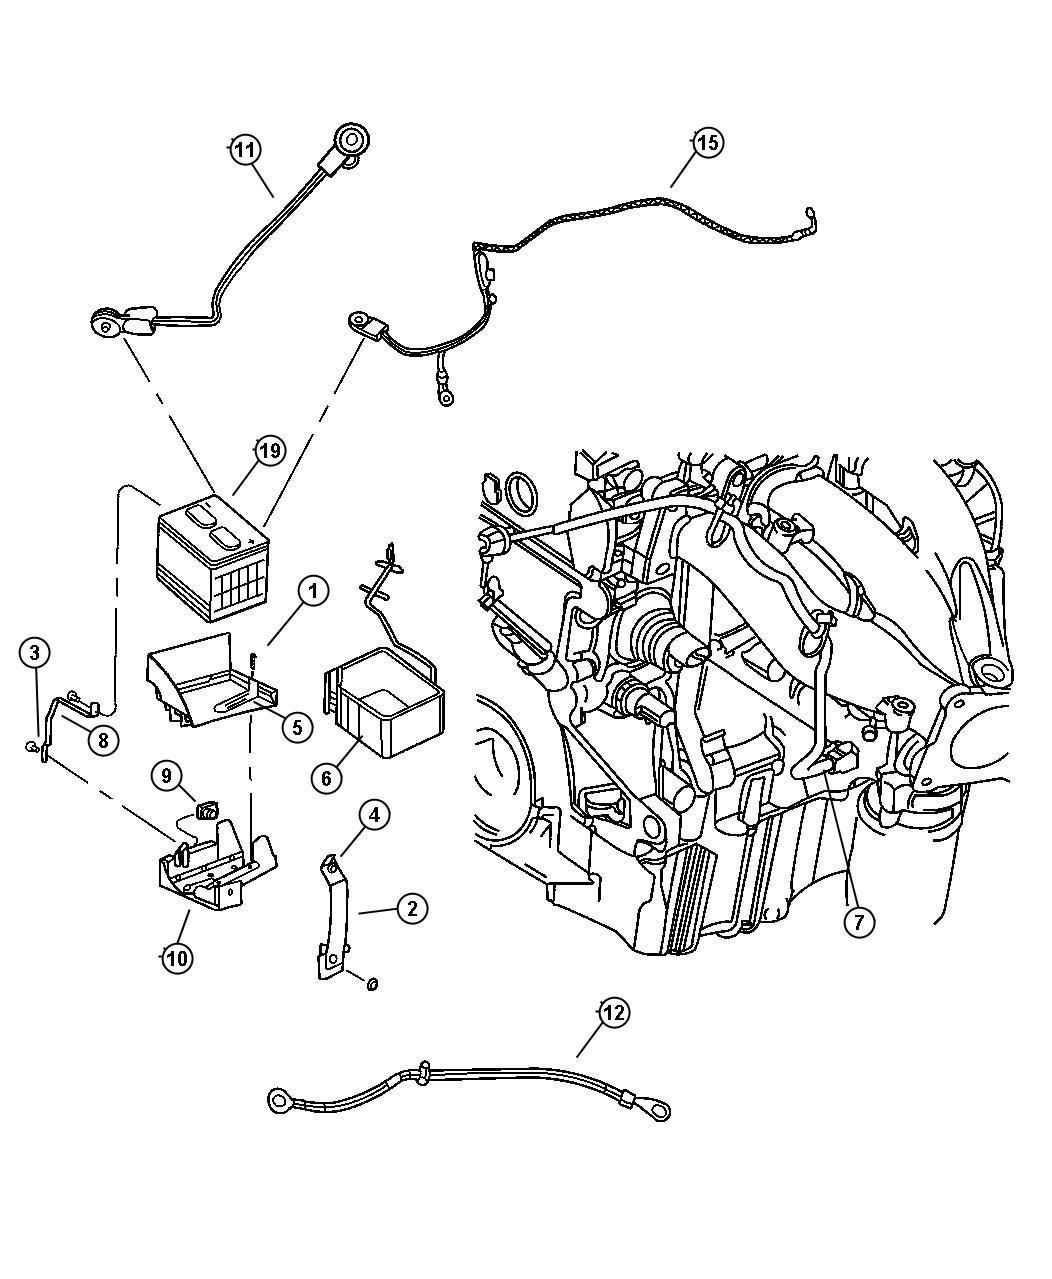 Dodge Stratus Nut M10x1 50 Battery Ground Negative